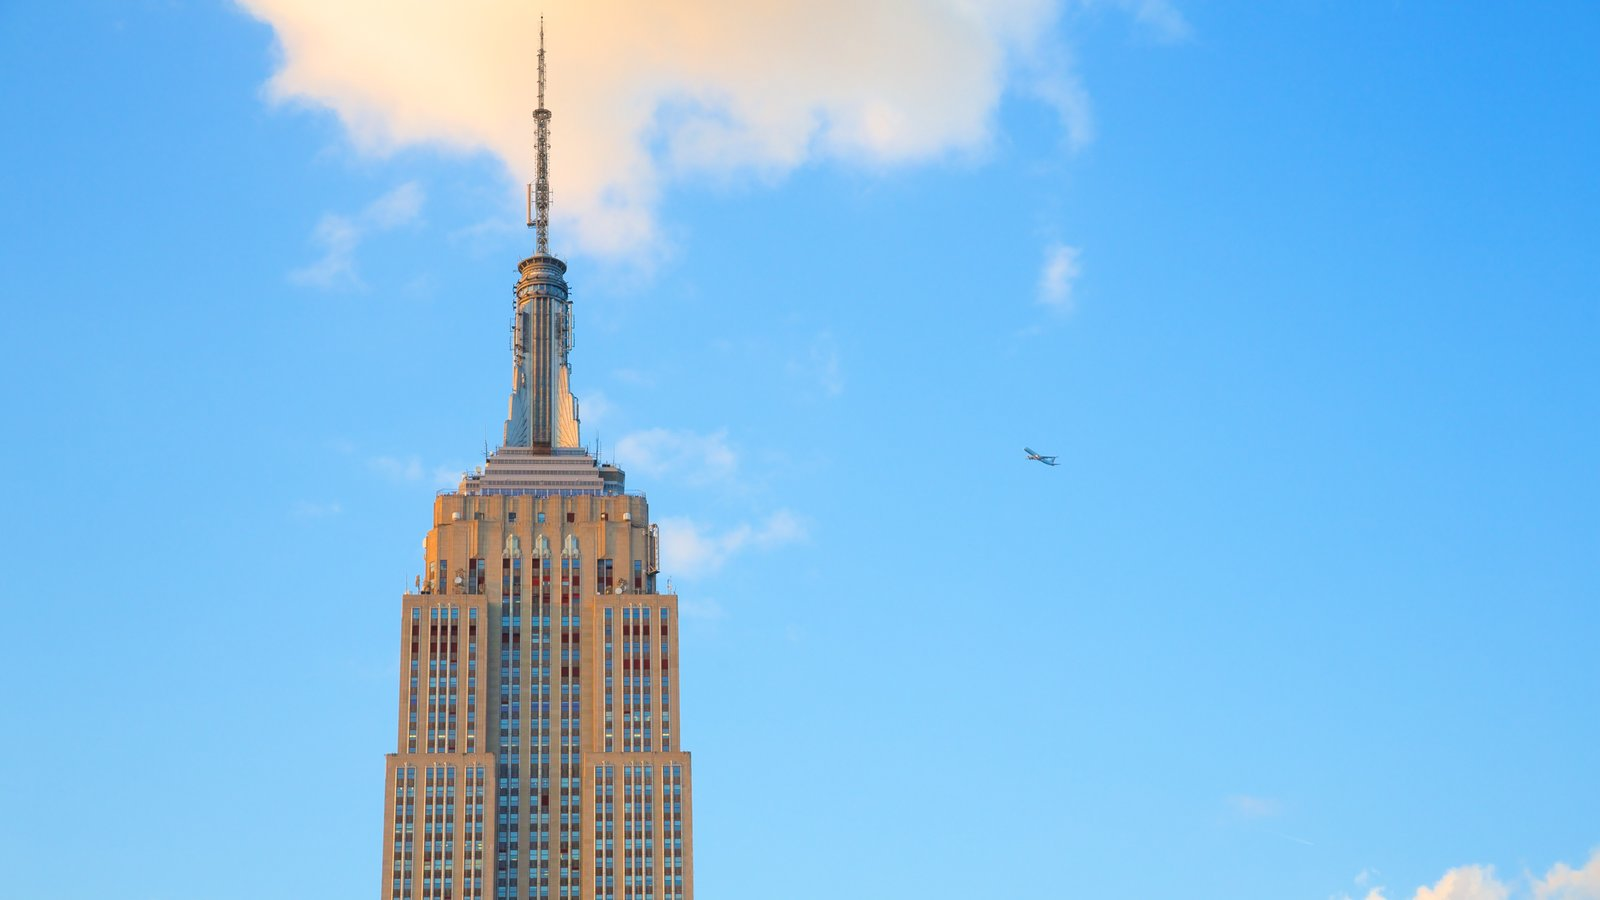 Empire State Building which includes a skyscraper and a city